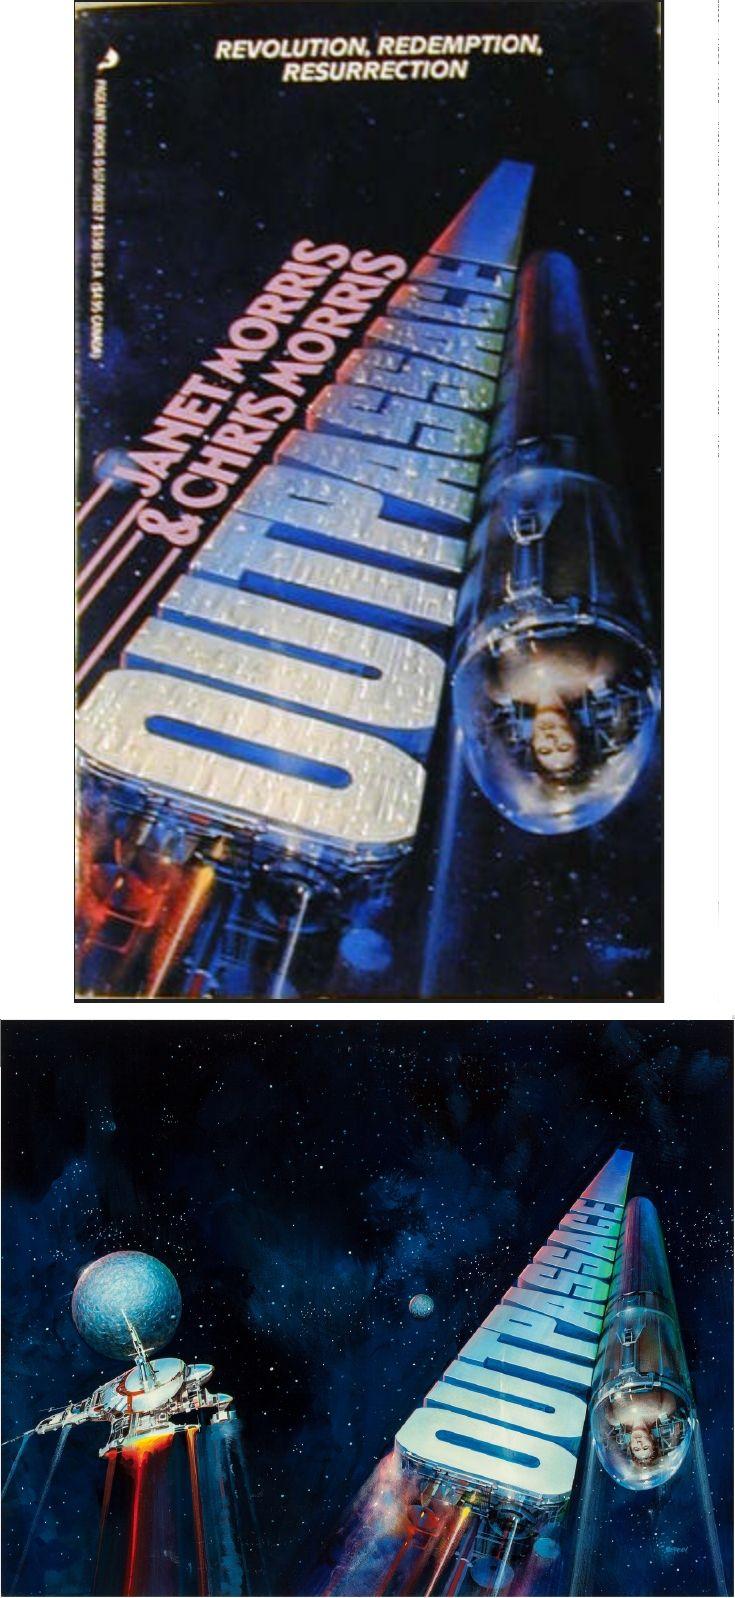 JOHN BERKEY - Outpassage by Chris Morris & Janet Morris - 1988 Pageant Books - cover by amazon - print by fineart.ha